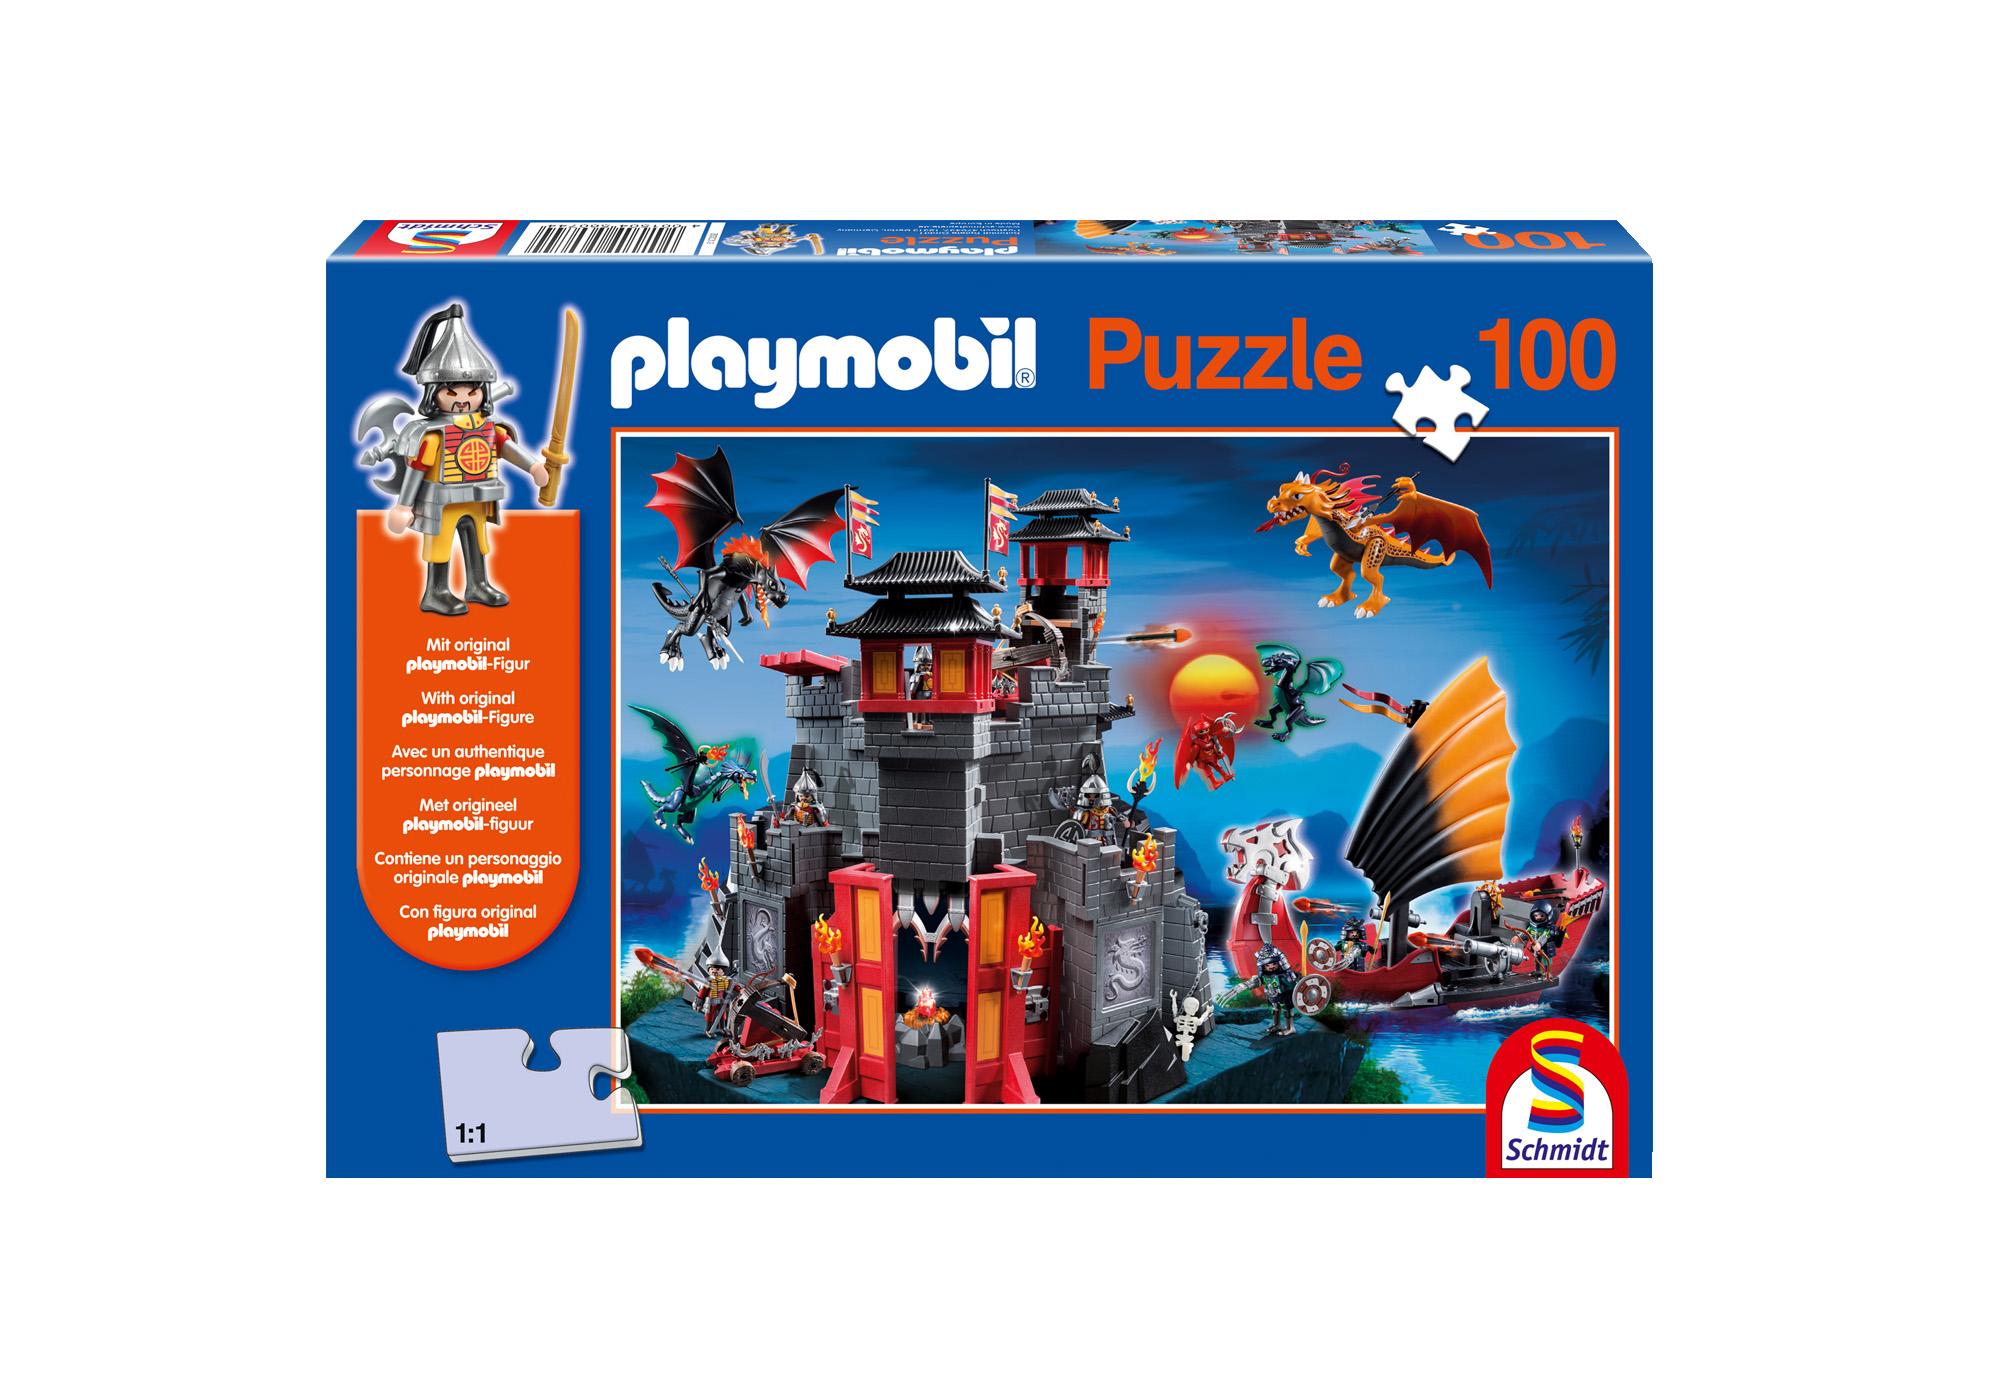 http://media.playmobil.com/i/playmobil/80372_product_detail/Puzzle Asia-Drachenland